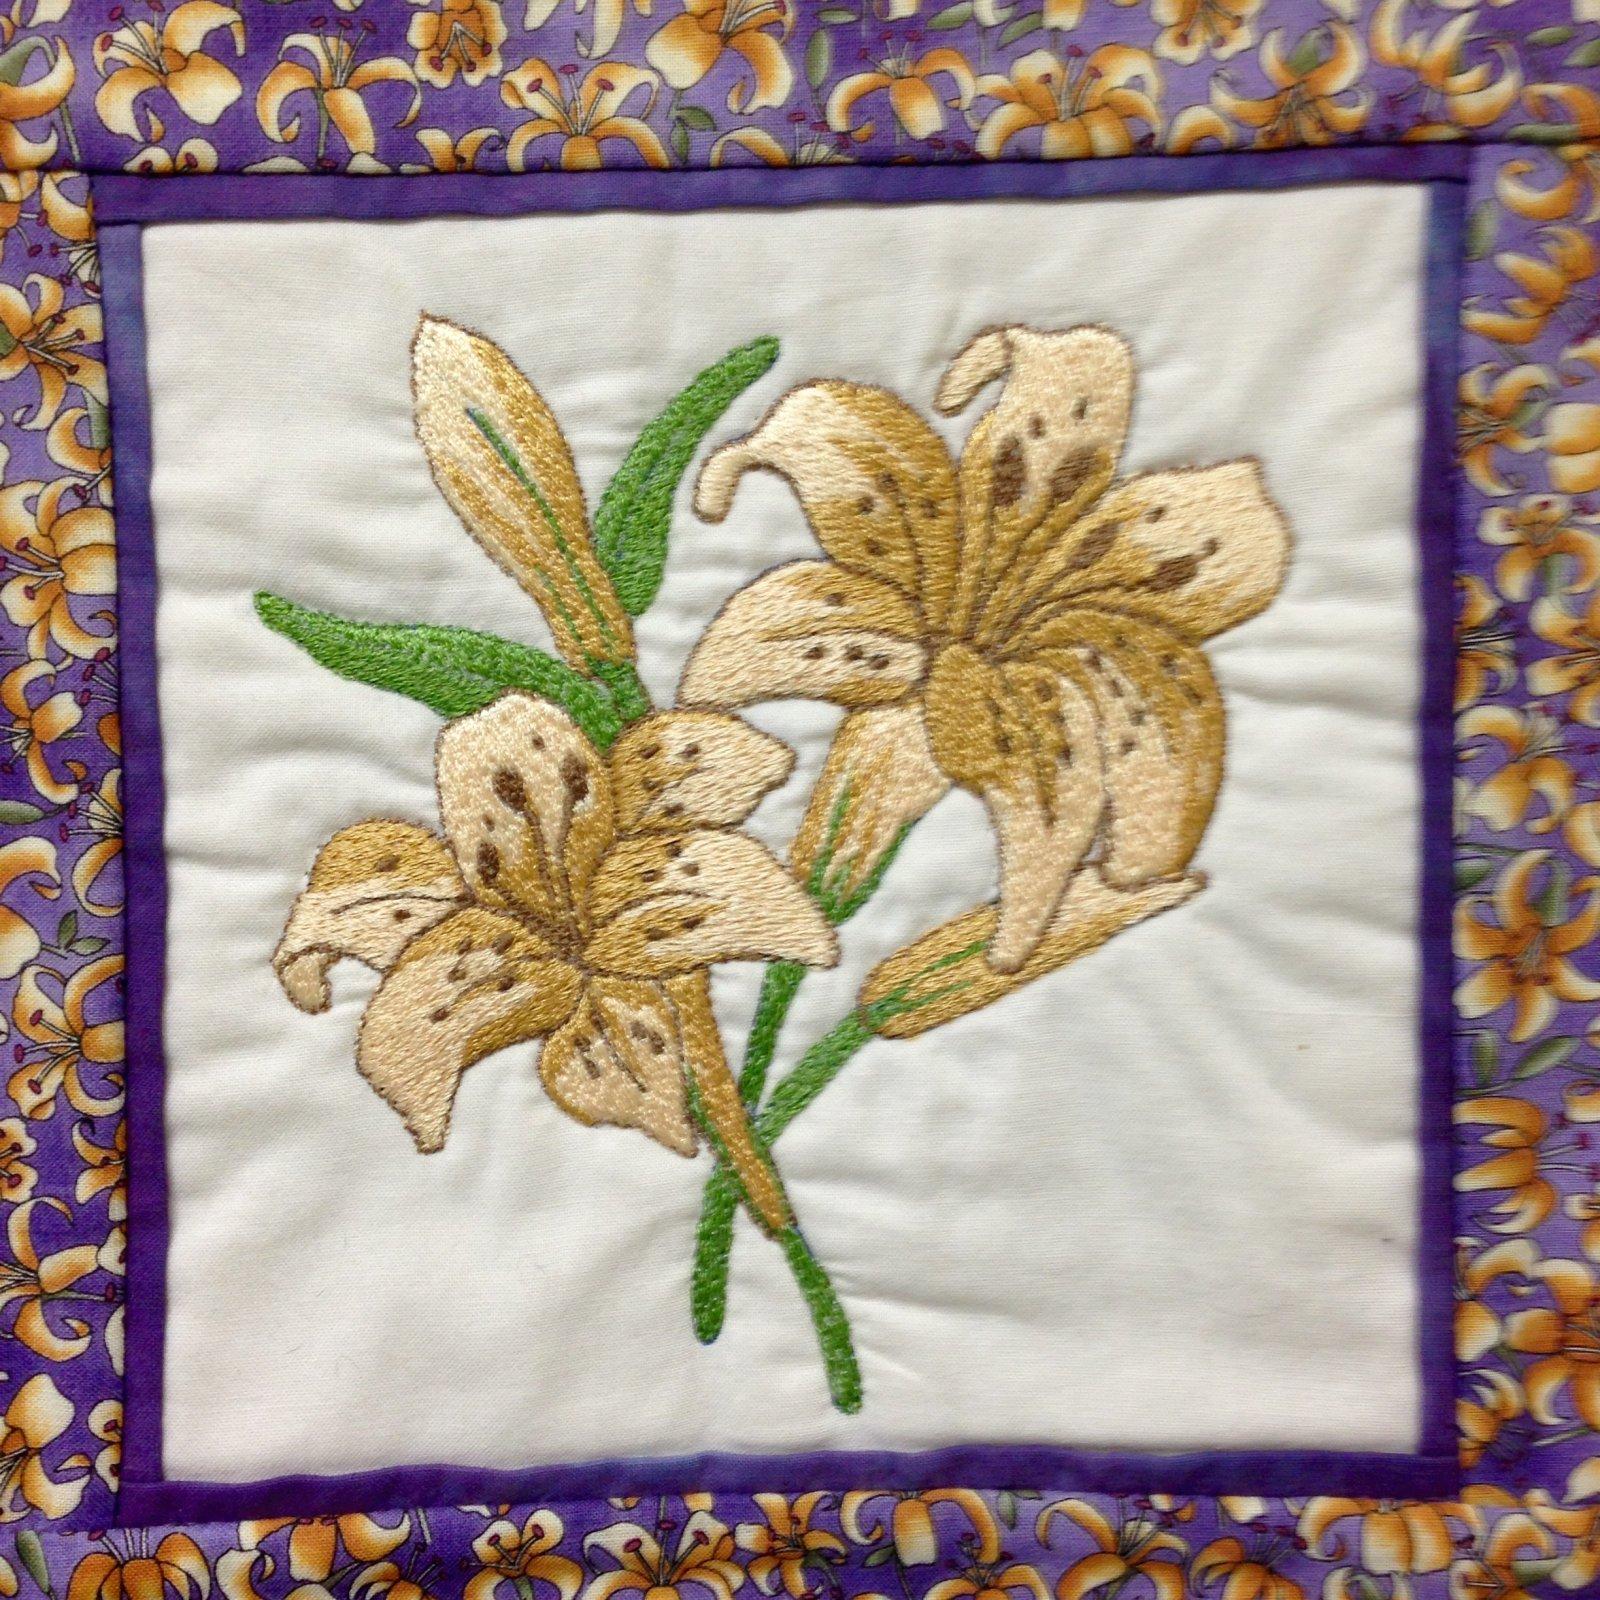 525: Thread Painting